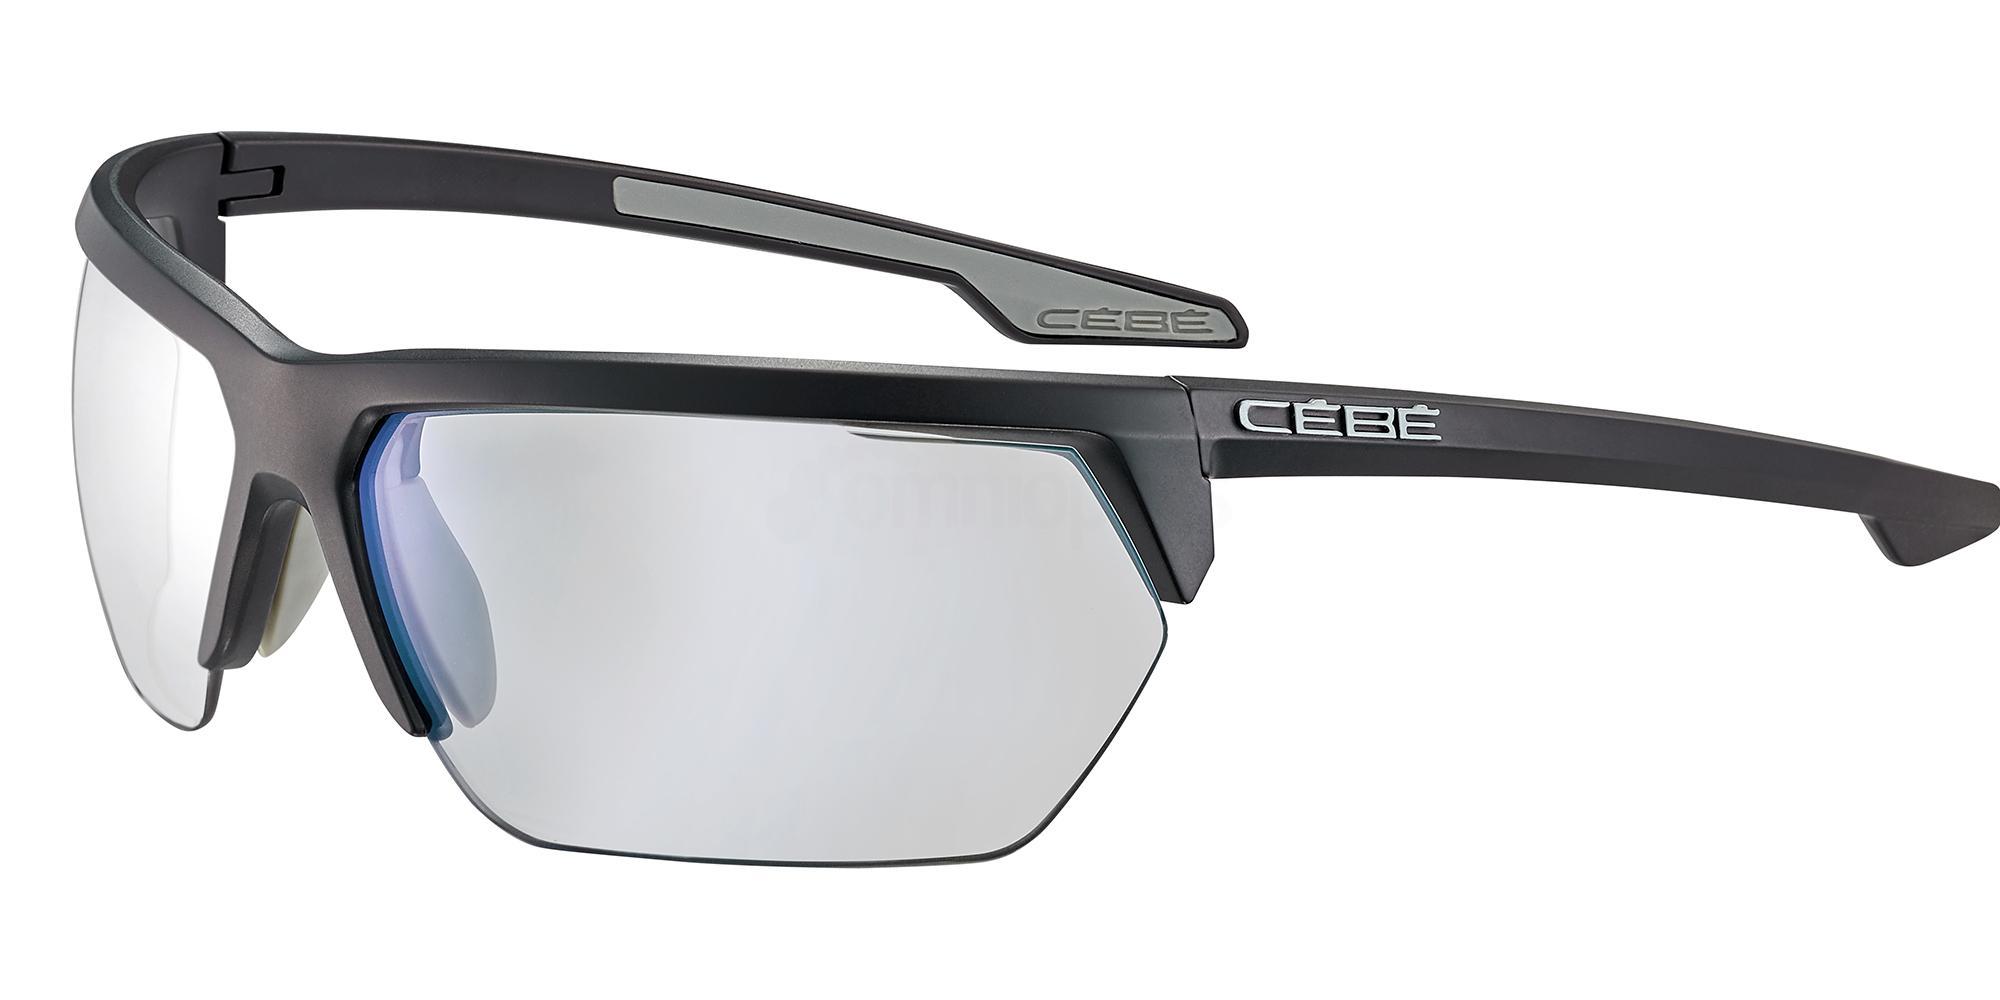 CBS087 CINETIK 2.0 Sunglasses, Cebe